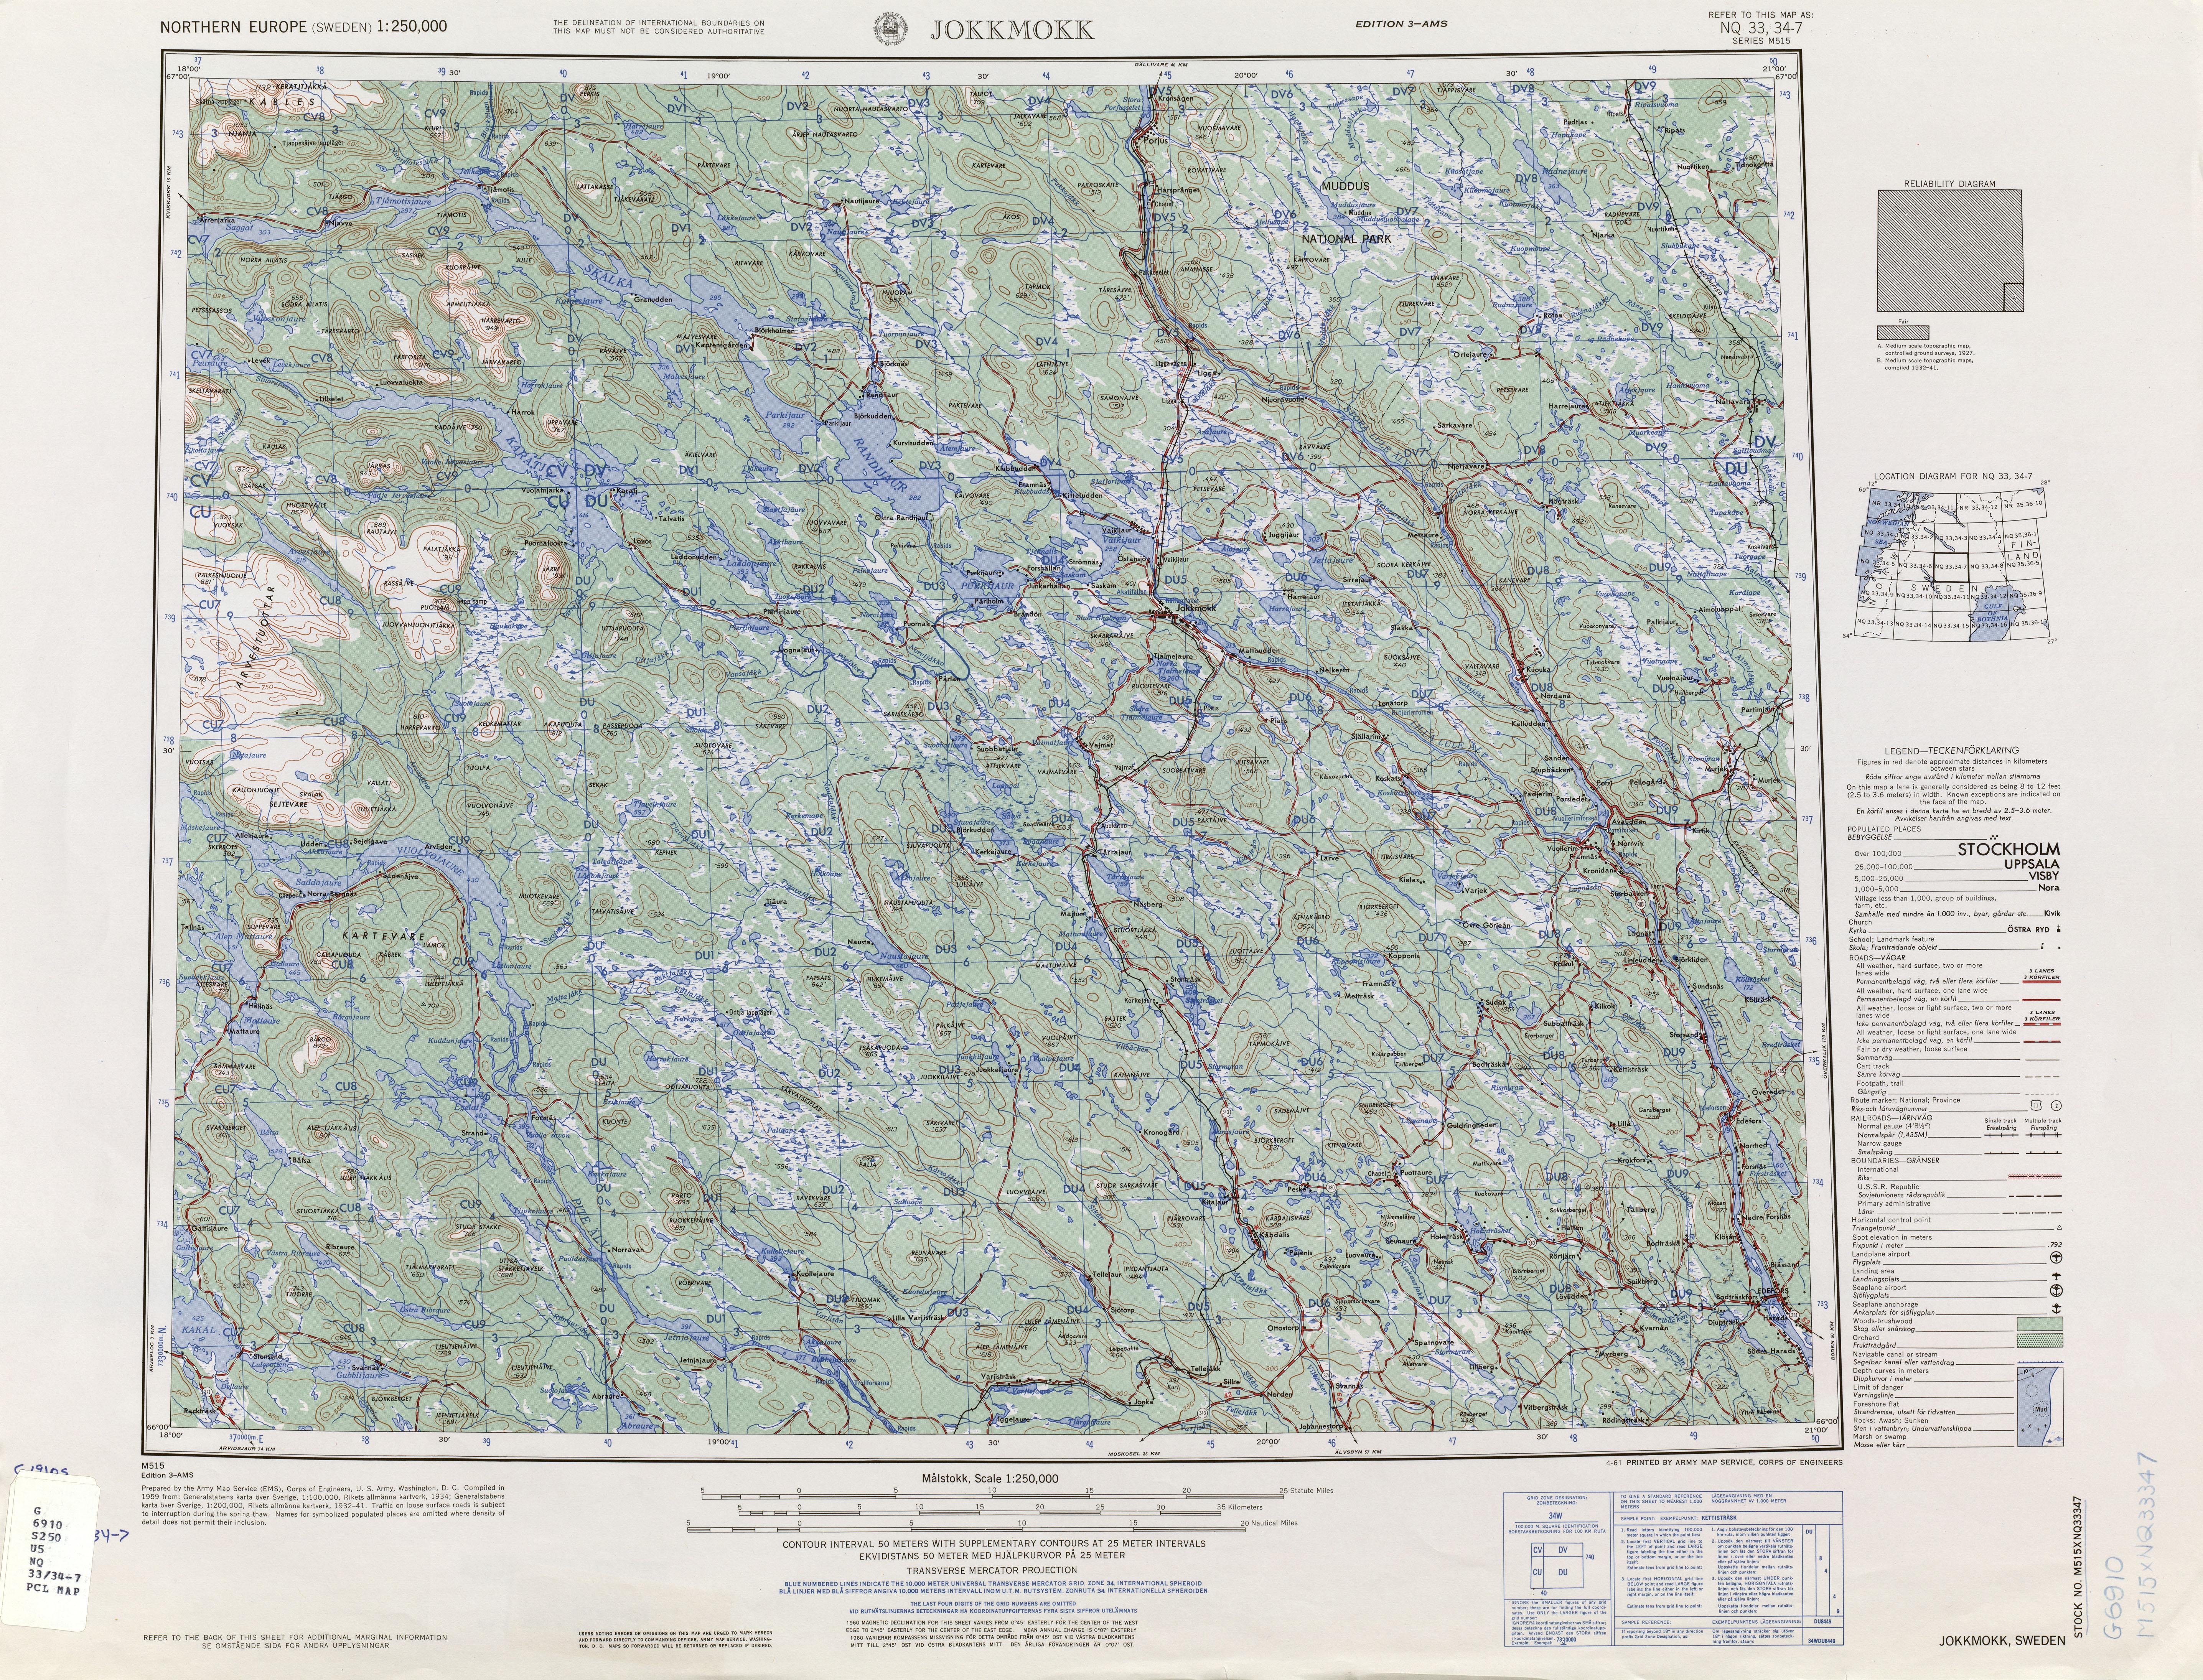 Northern Europe AMS Topographic Maps PerryCastañeda Map - Jokkmokk sweden map